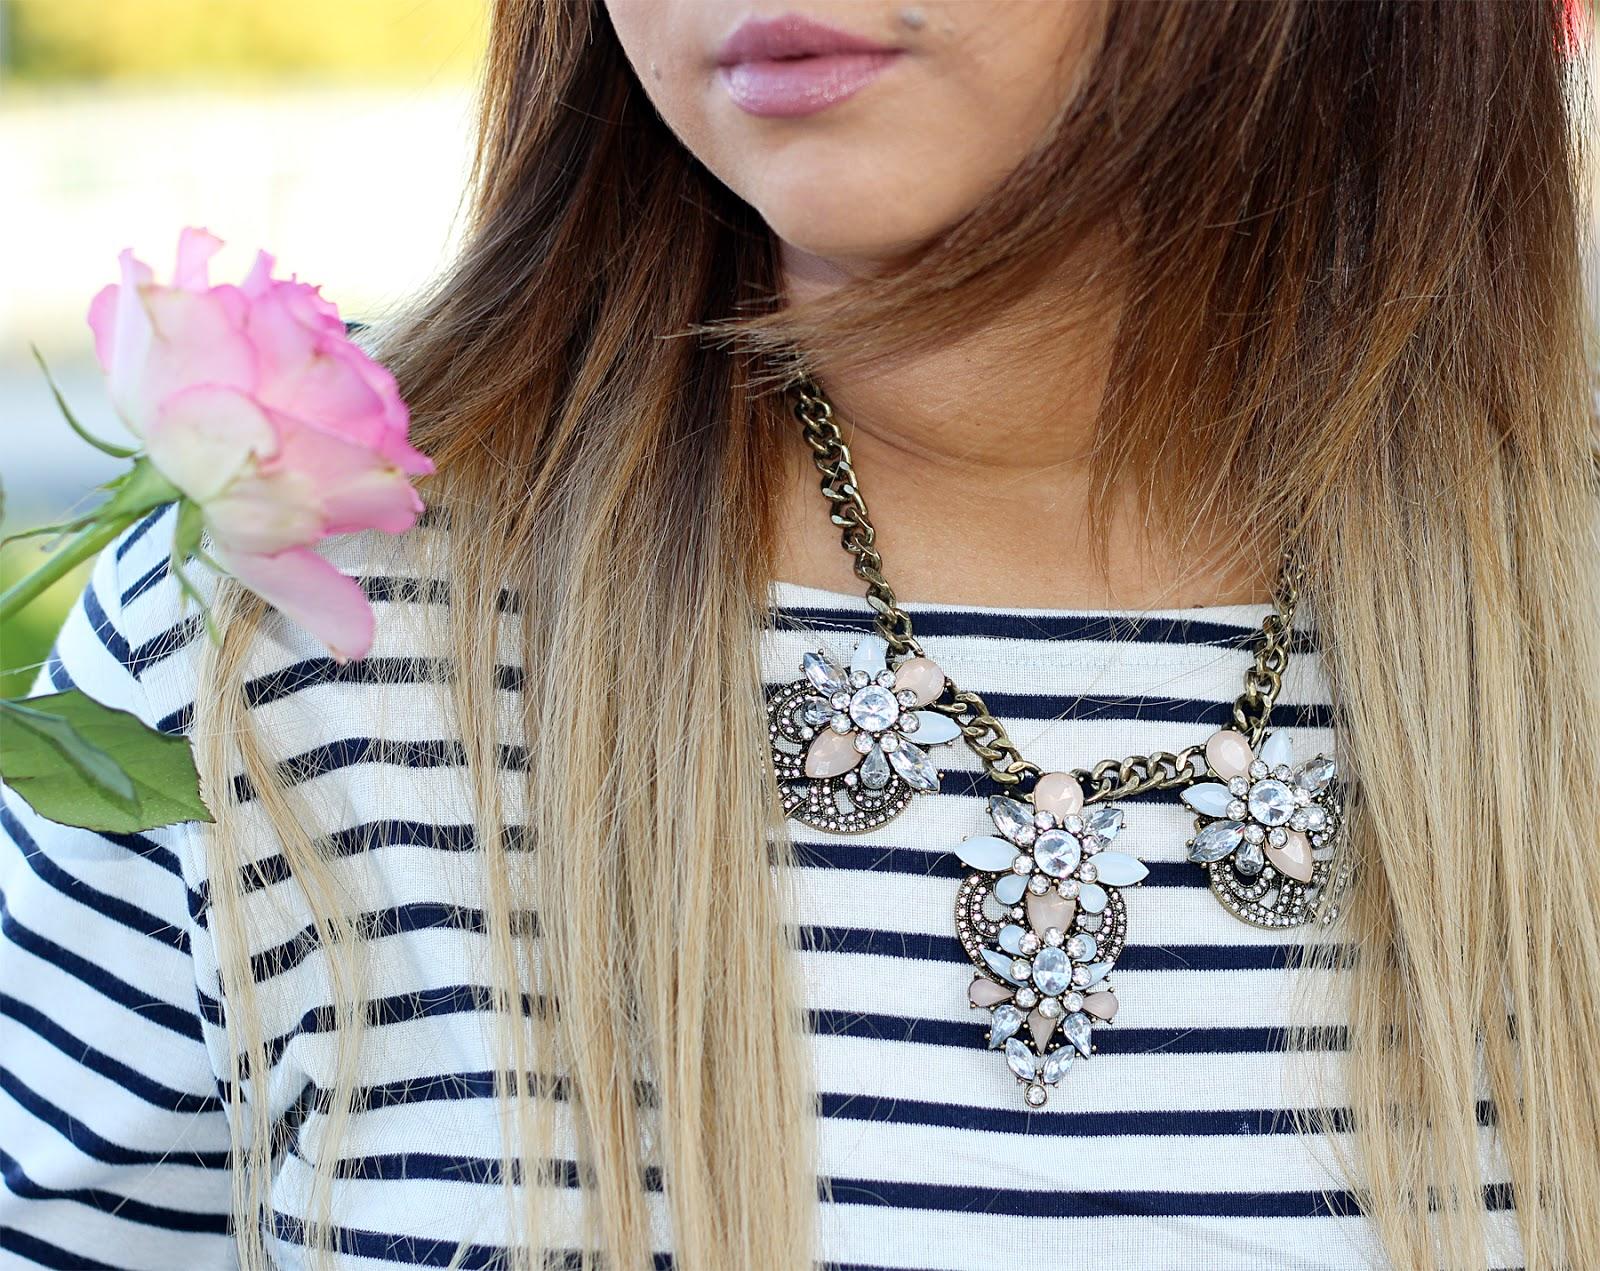 double ball earrings, dylanlex inspired necklace, statement jewellery, cape town blogger, zulu lulu